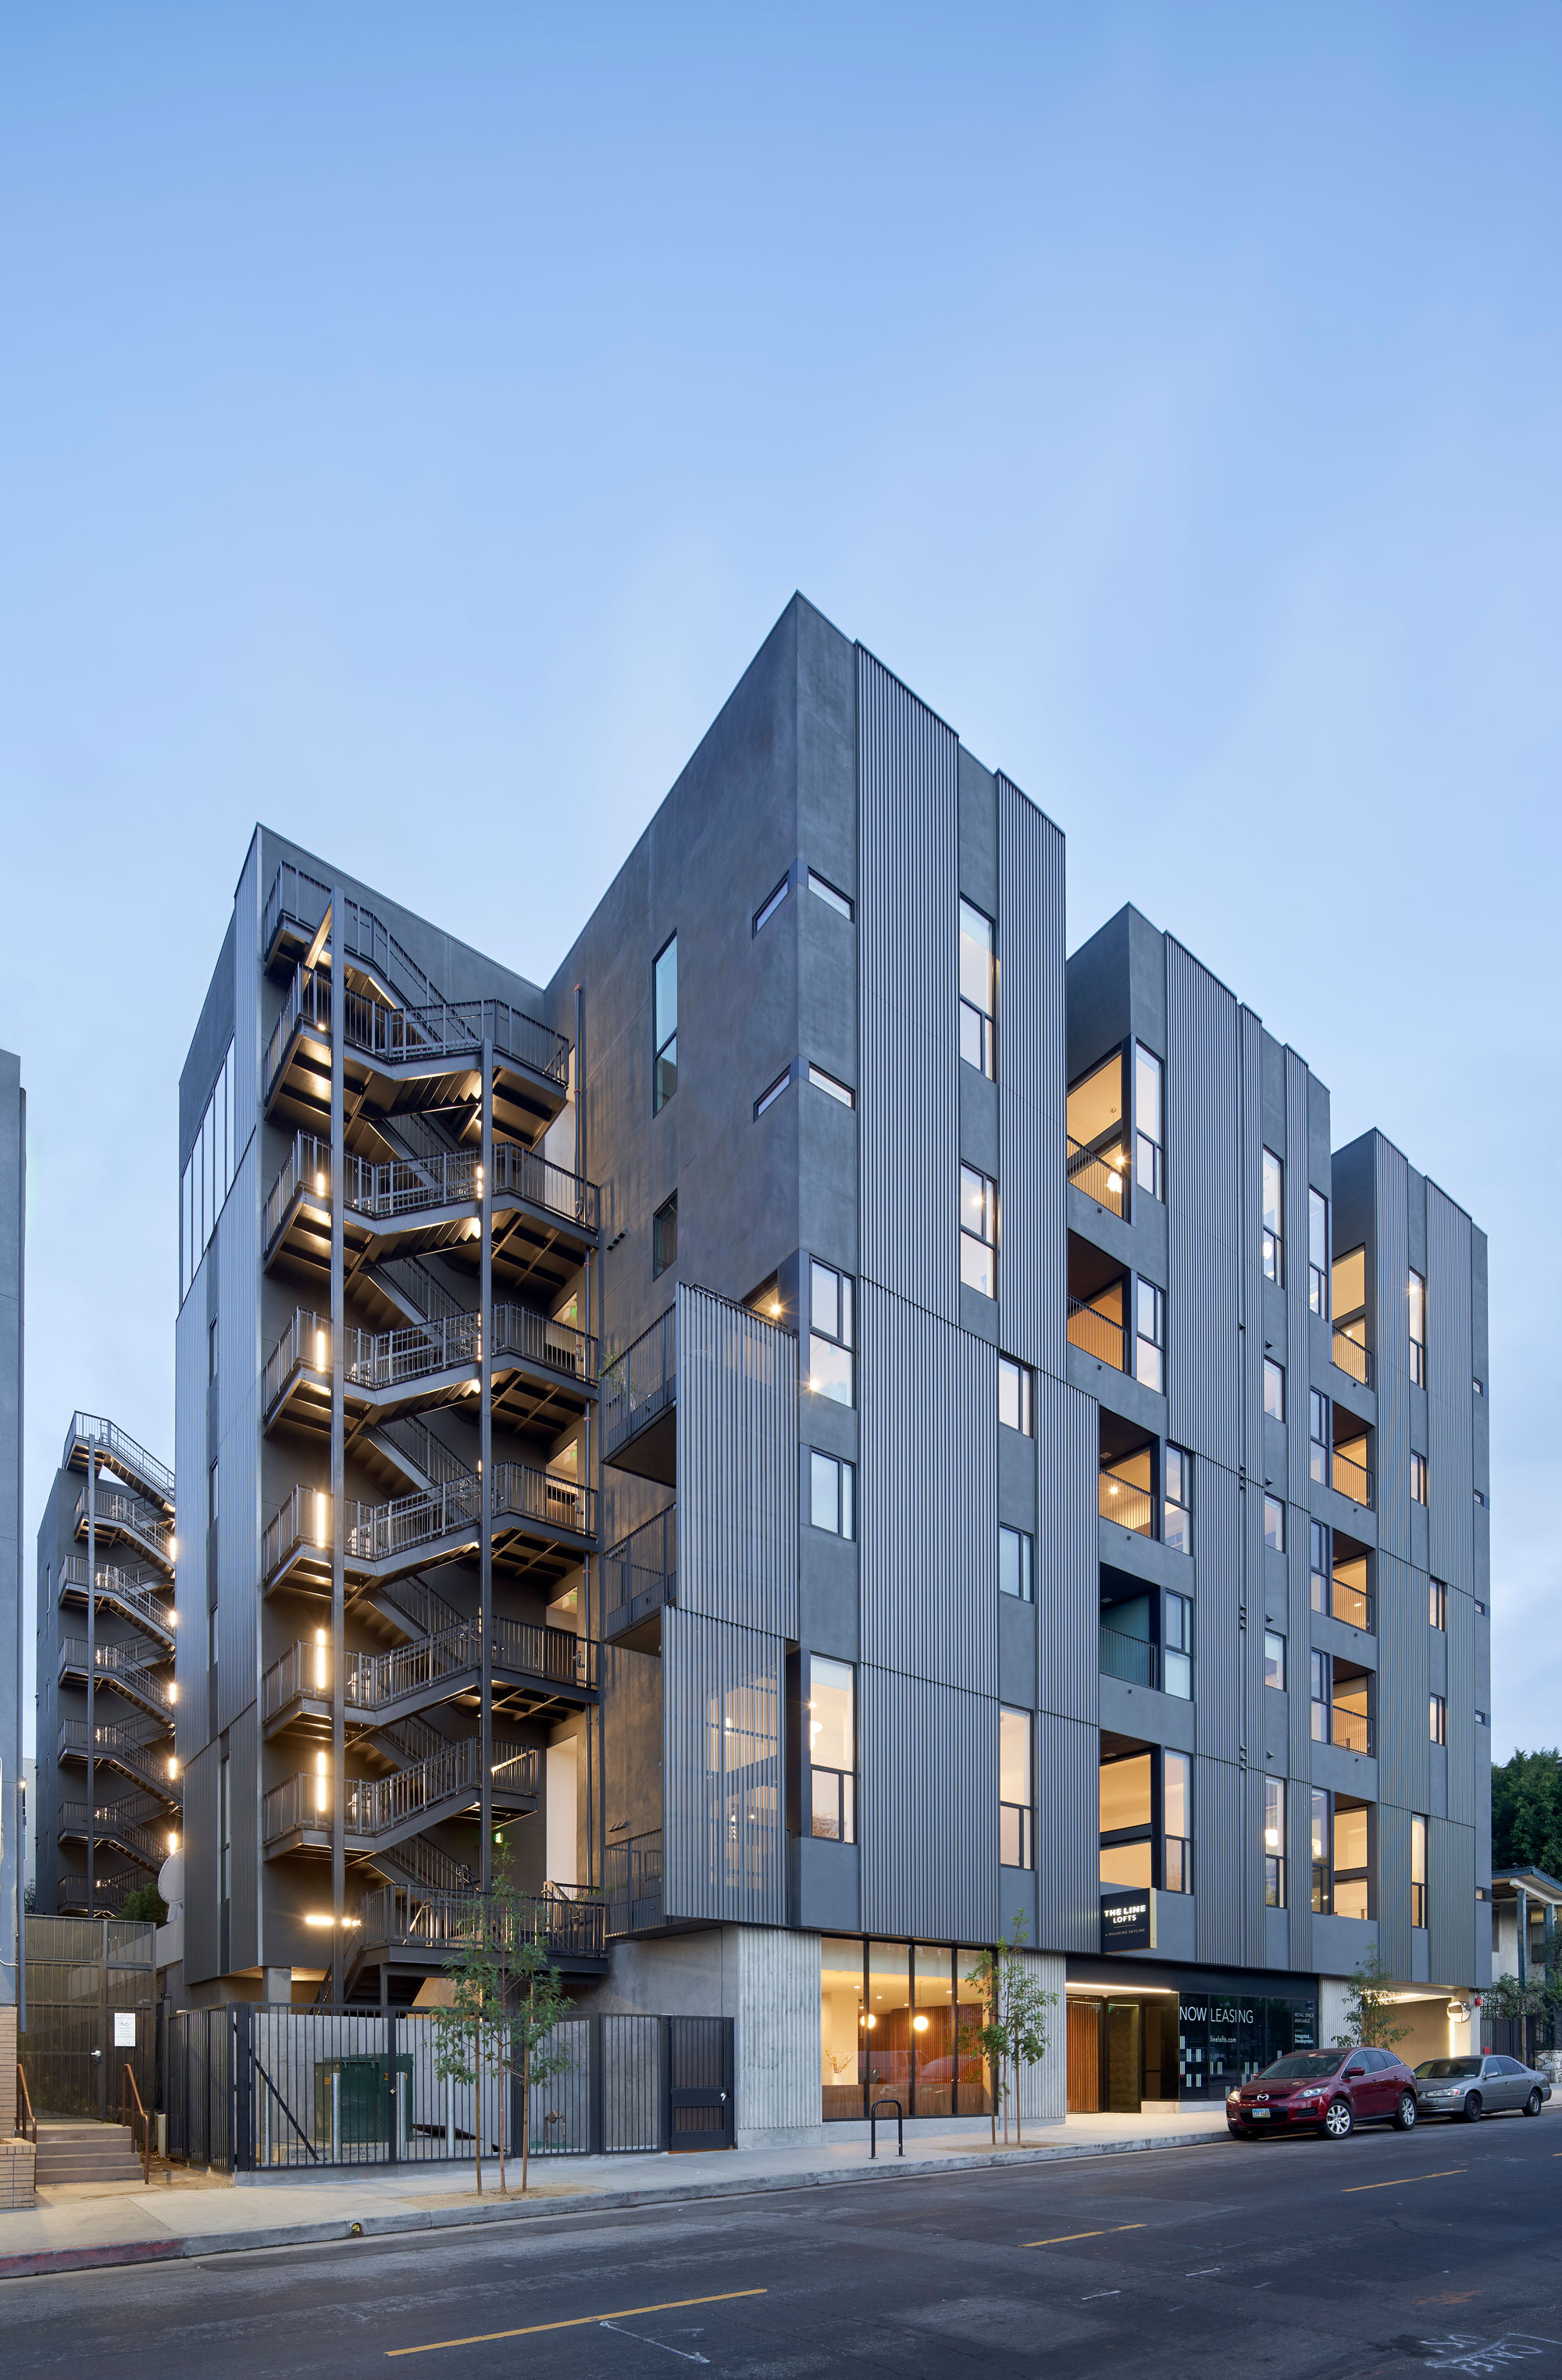 The Line Lofts Spf Architects Archello